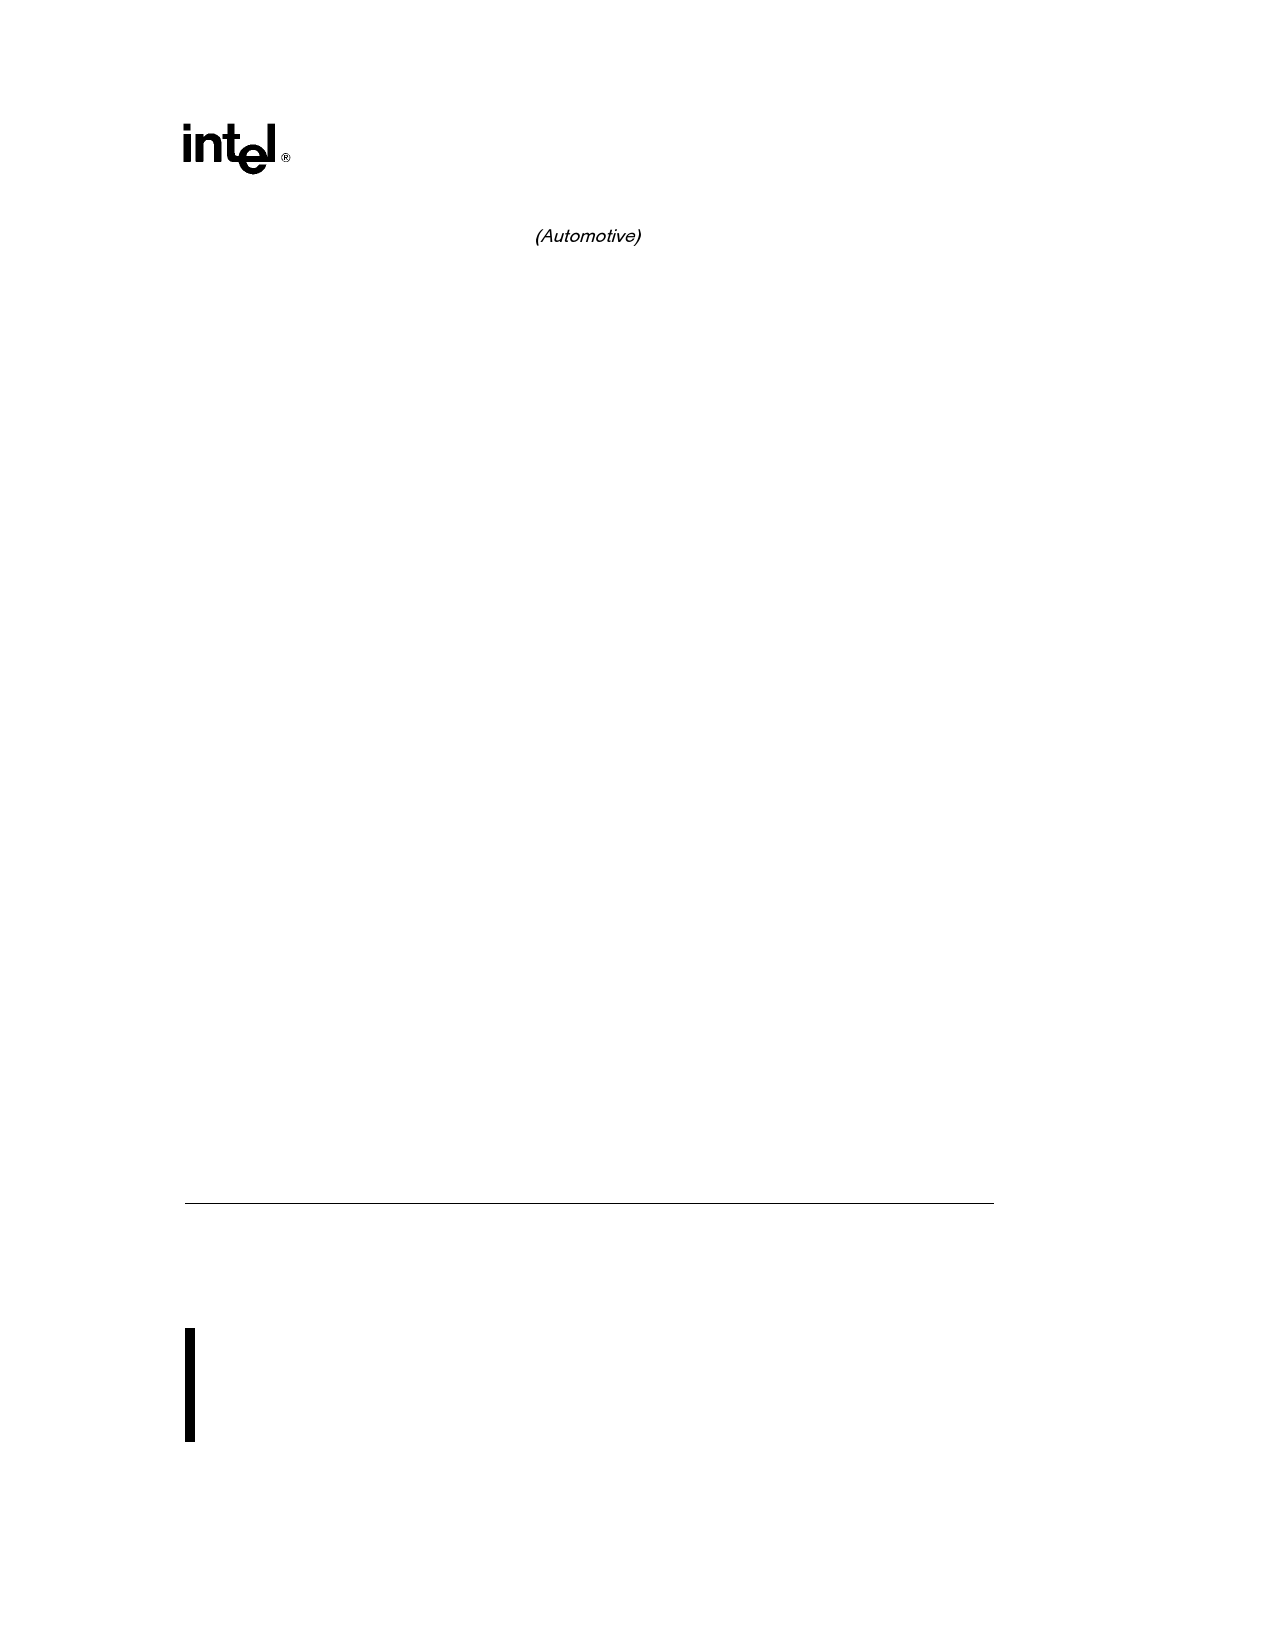 A28F010 datasheet, circuit